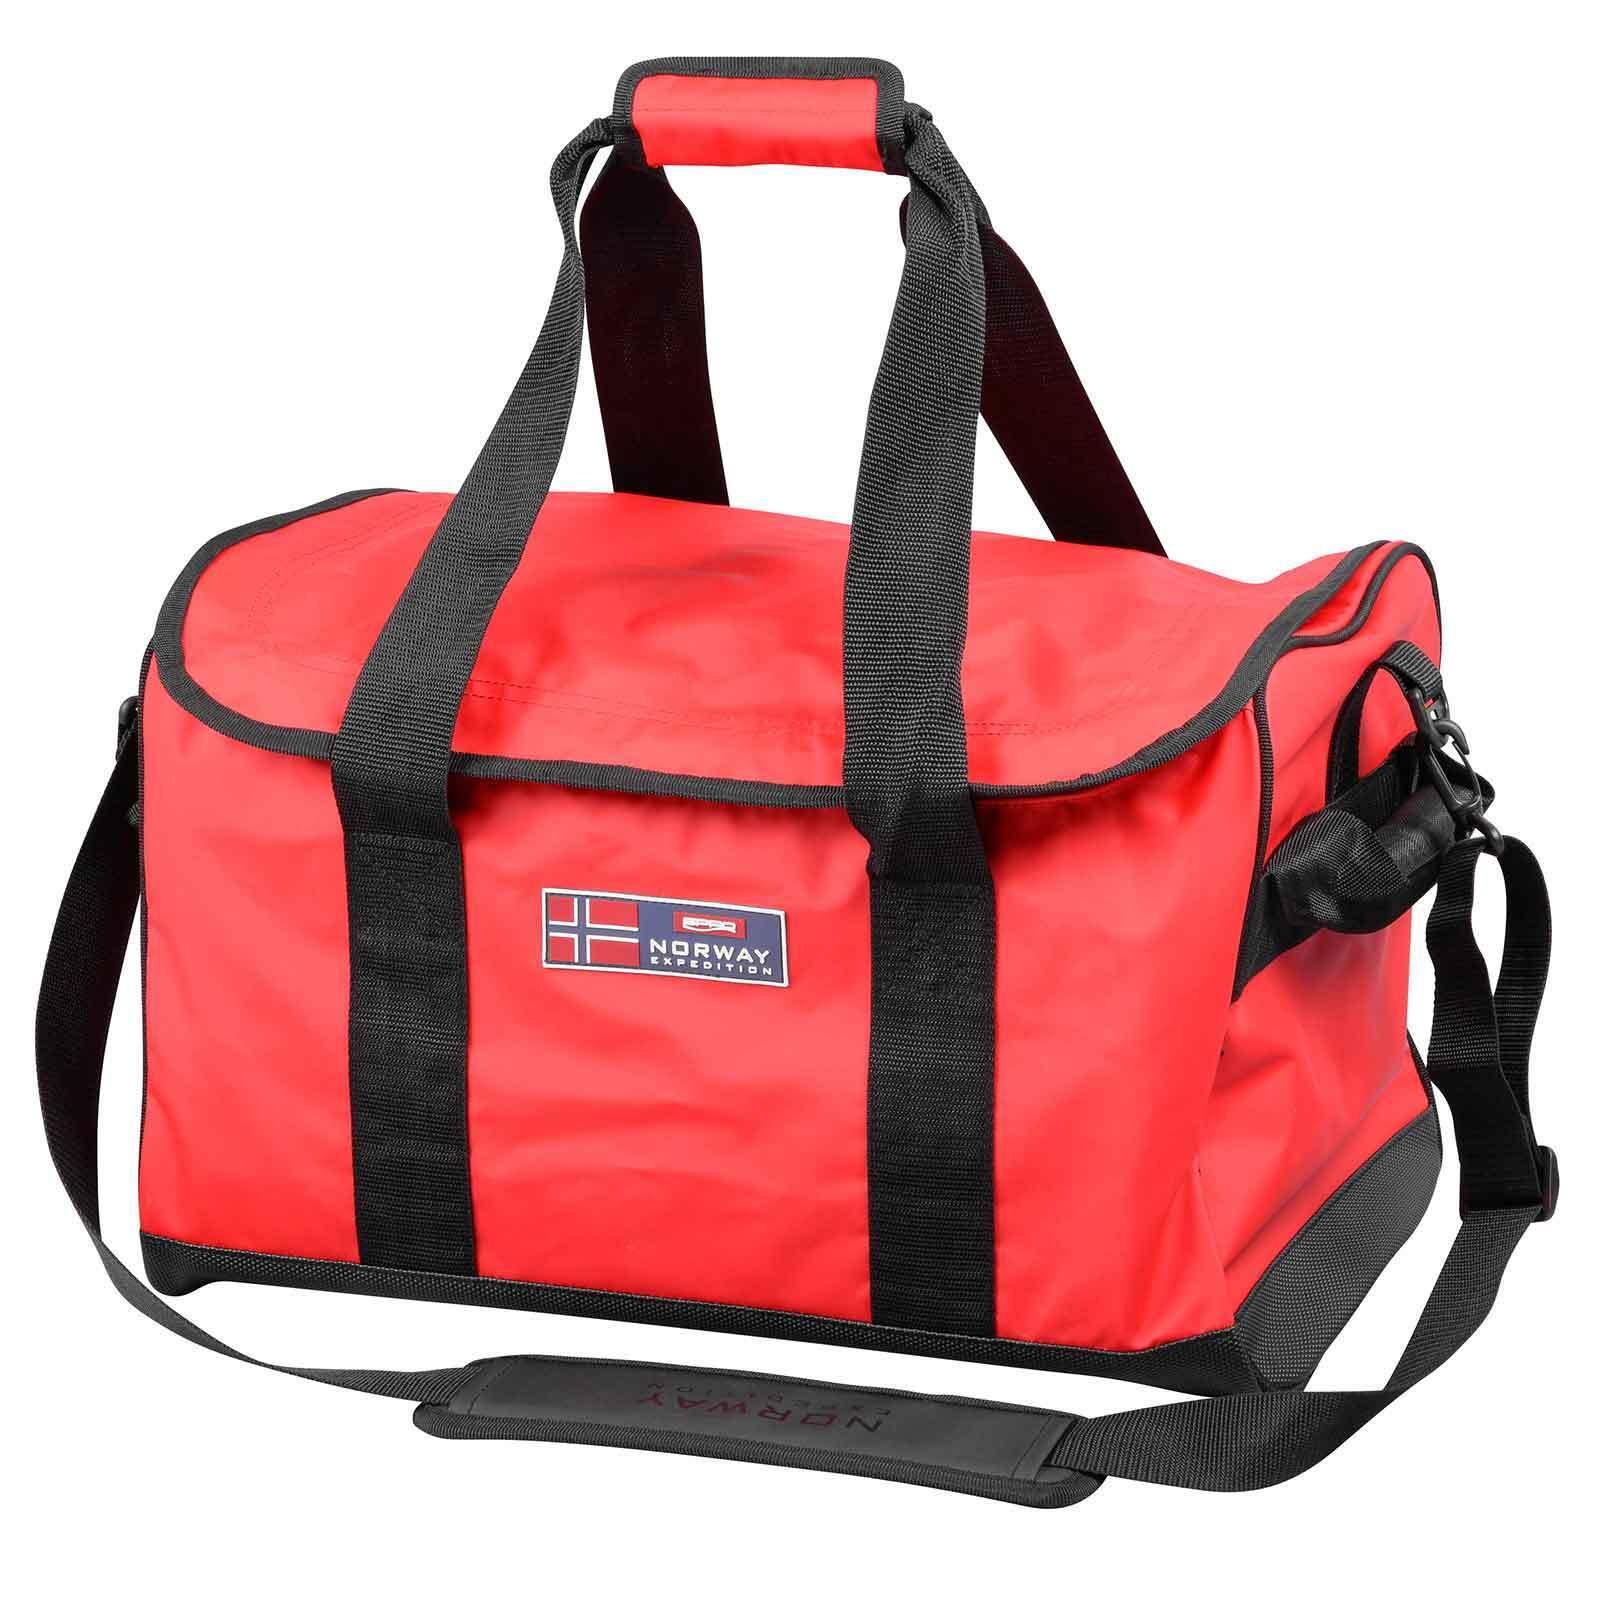 Spro Angeltasche Meeresangeln Tasche - Norway Expedition HD Duffel Bag Bag Bag 48cm 81ecd4